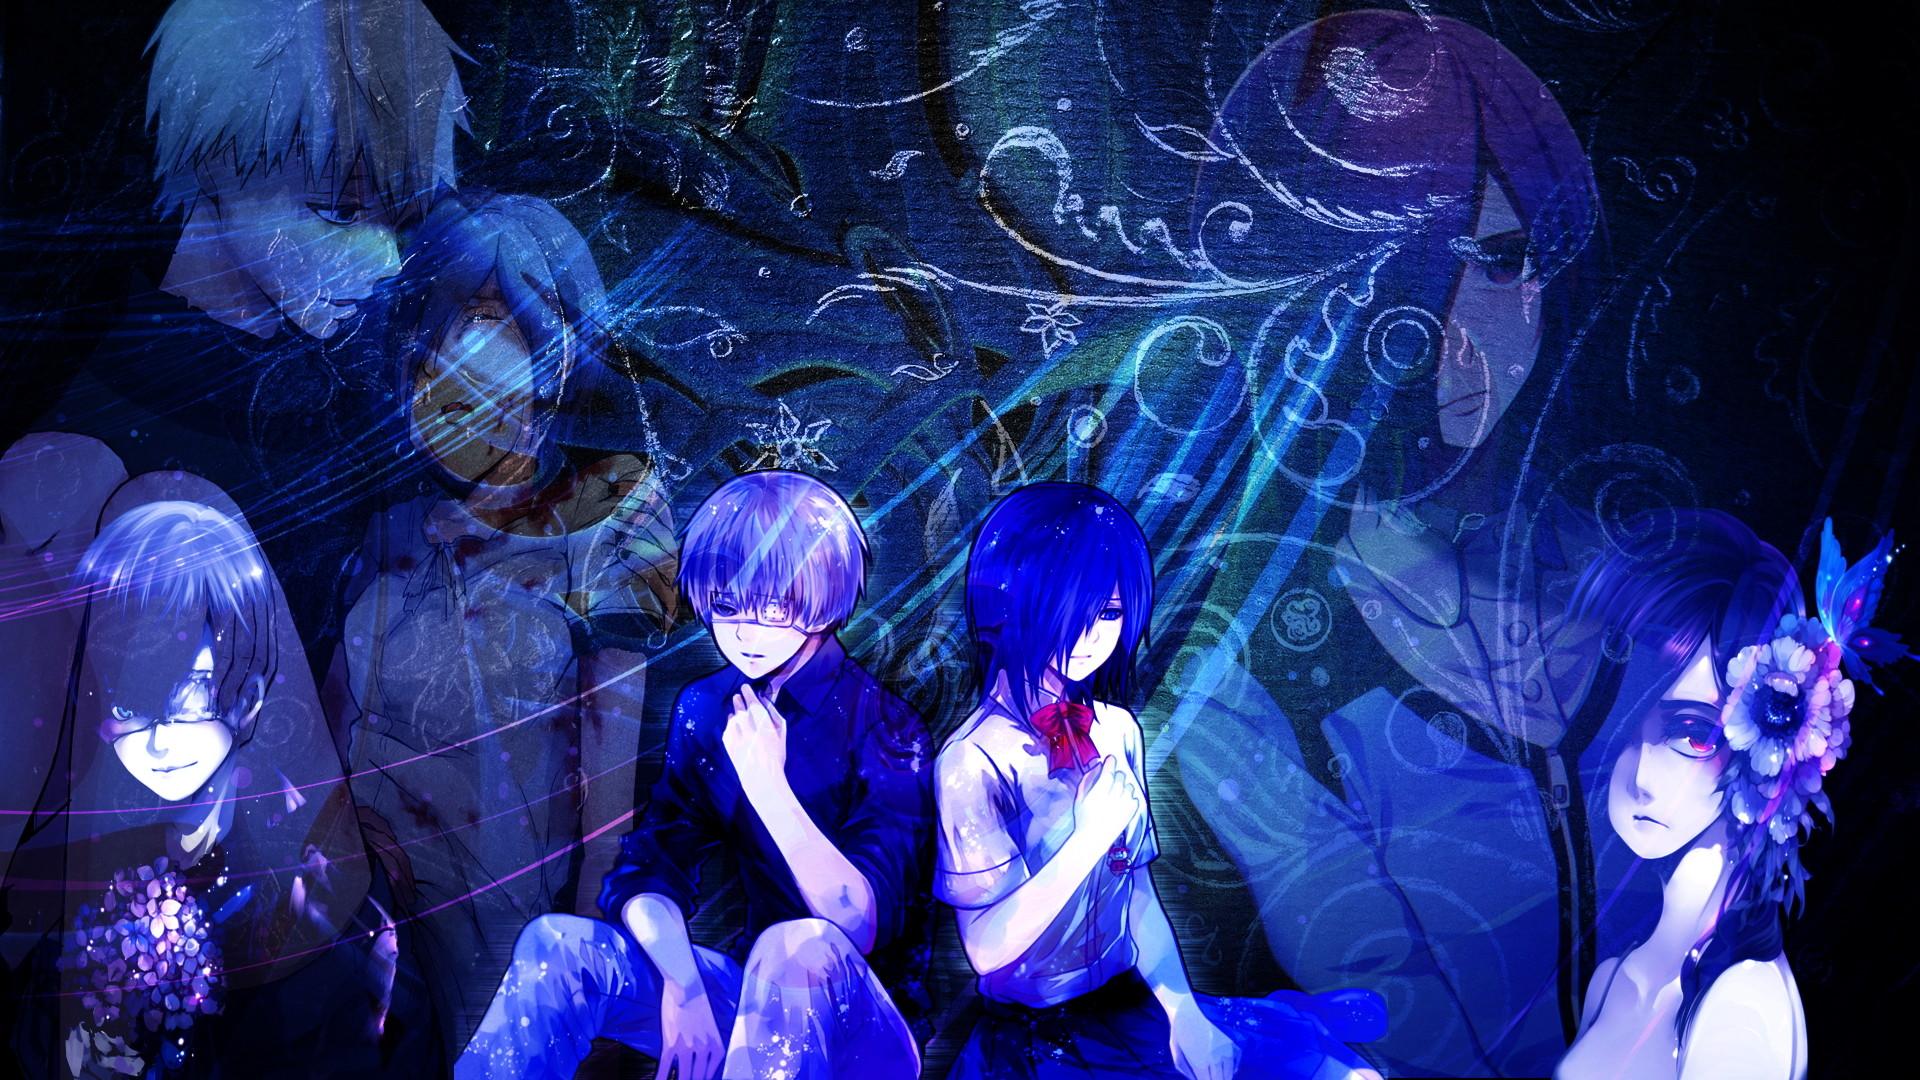 … (Tokyo Ghoul) Touka and Kaneki Wallpaper by nestroix